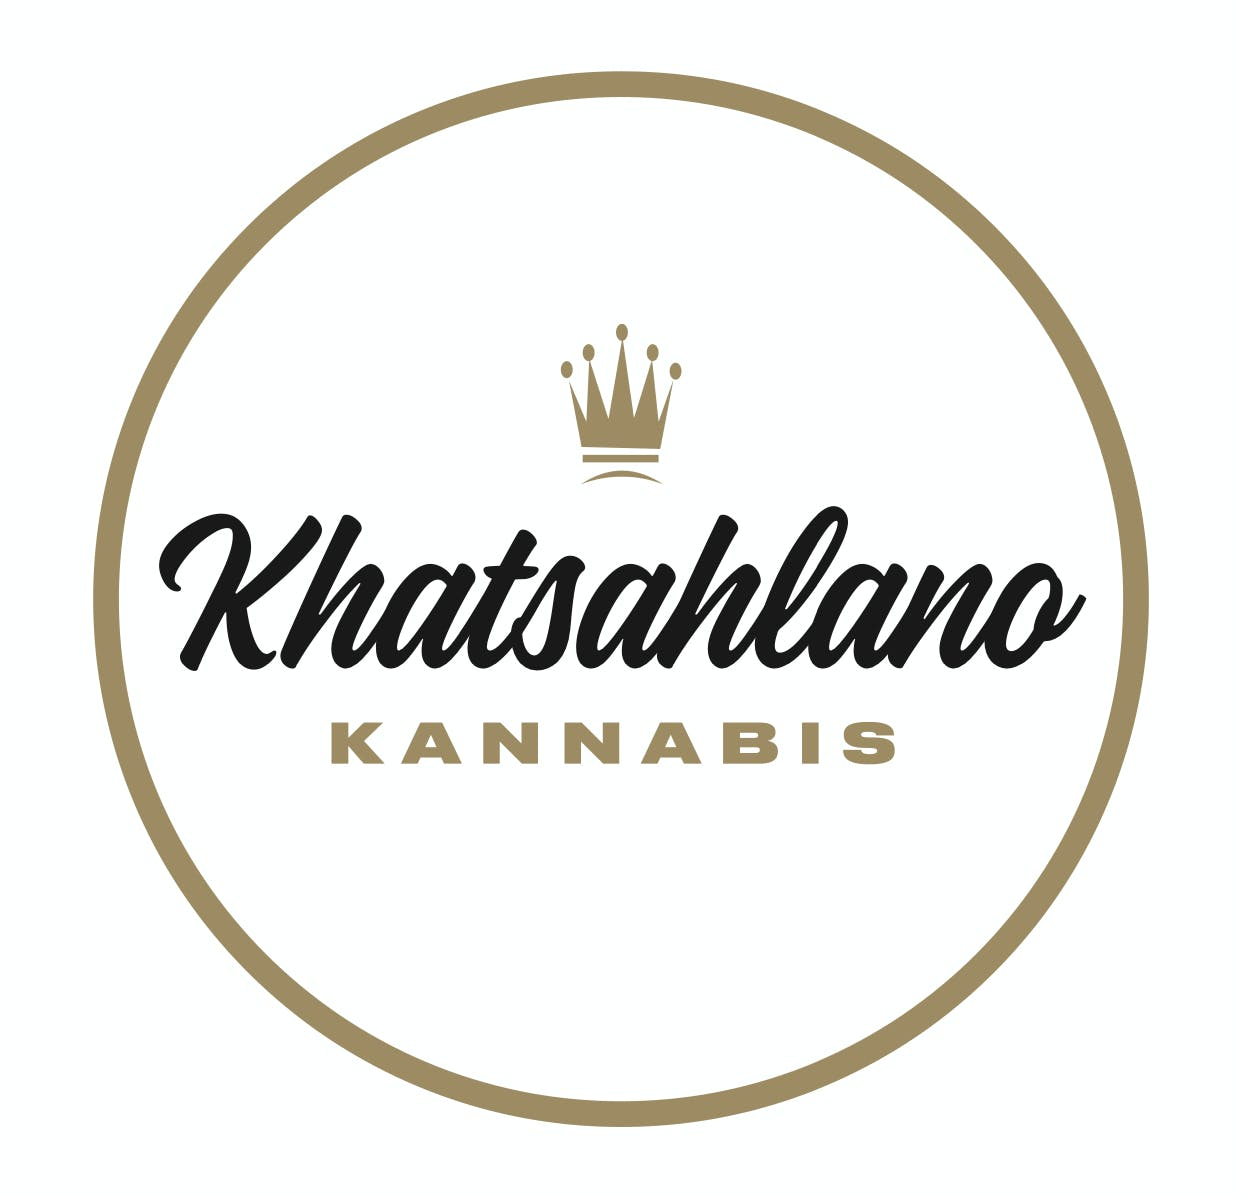 Khatsahlano Kannabis